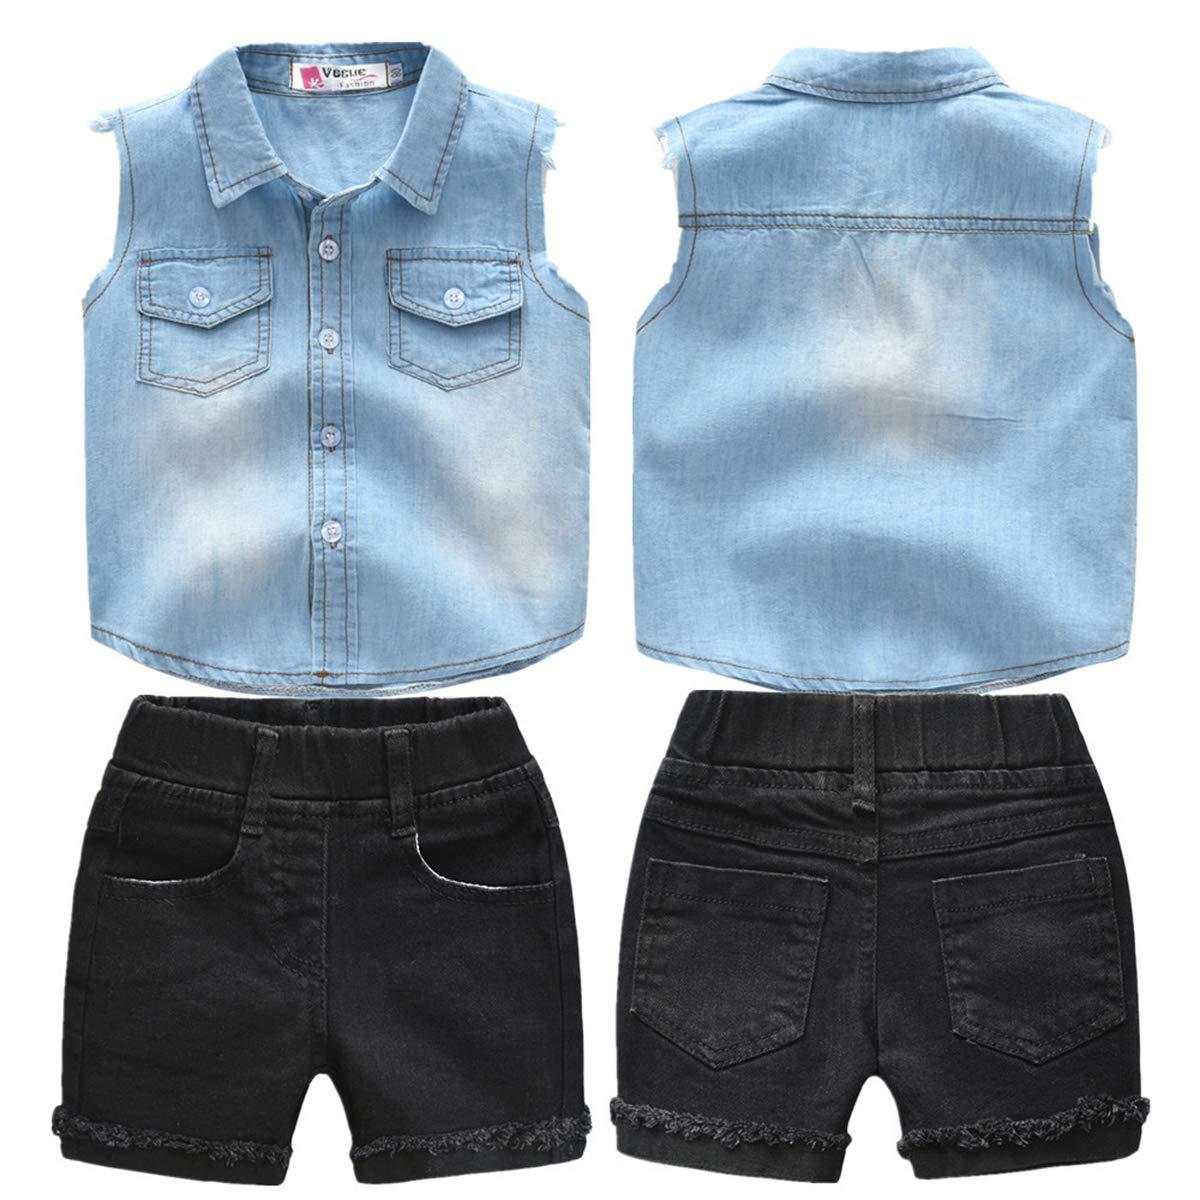 Mornyray Kids Boys Summer 2Pcs Casual Short Set Denim Vest+Denim Shorts